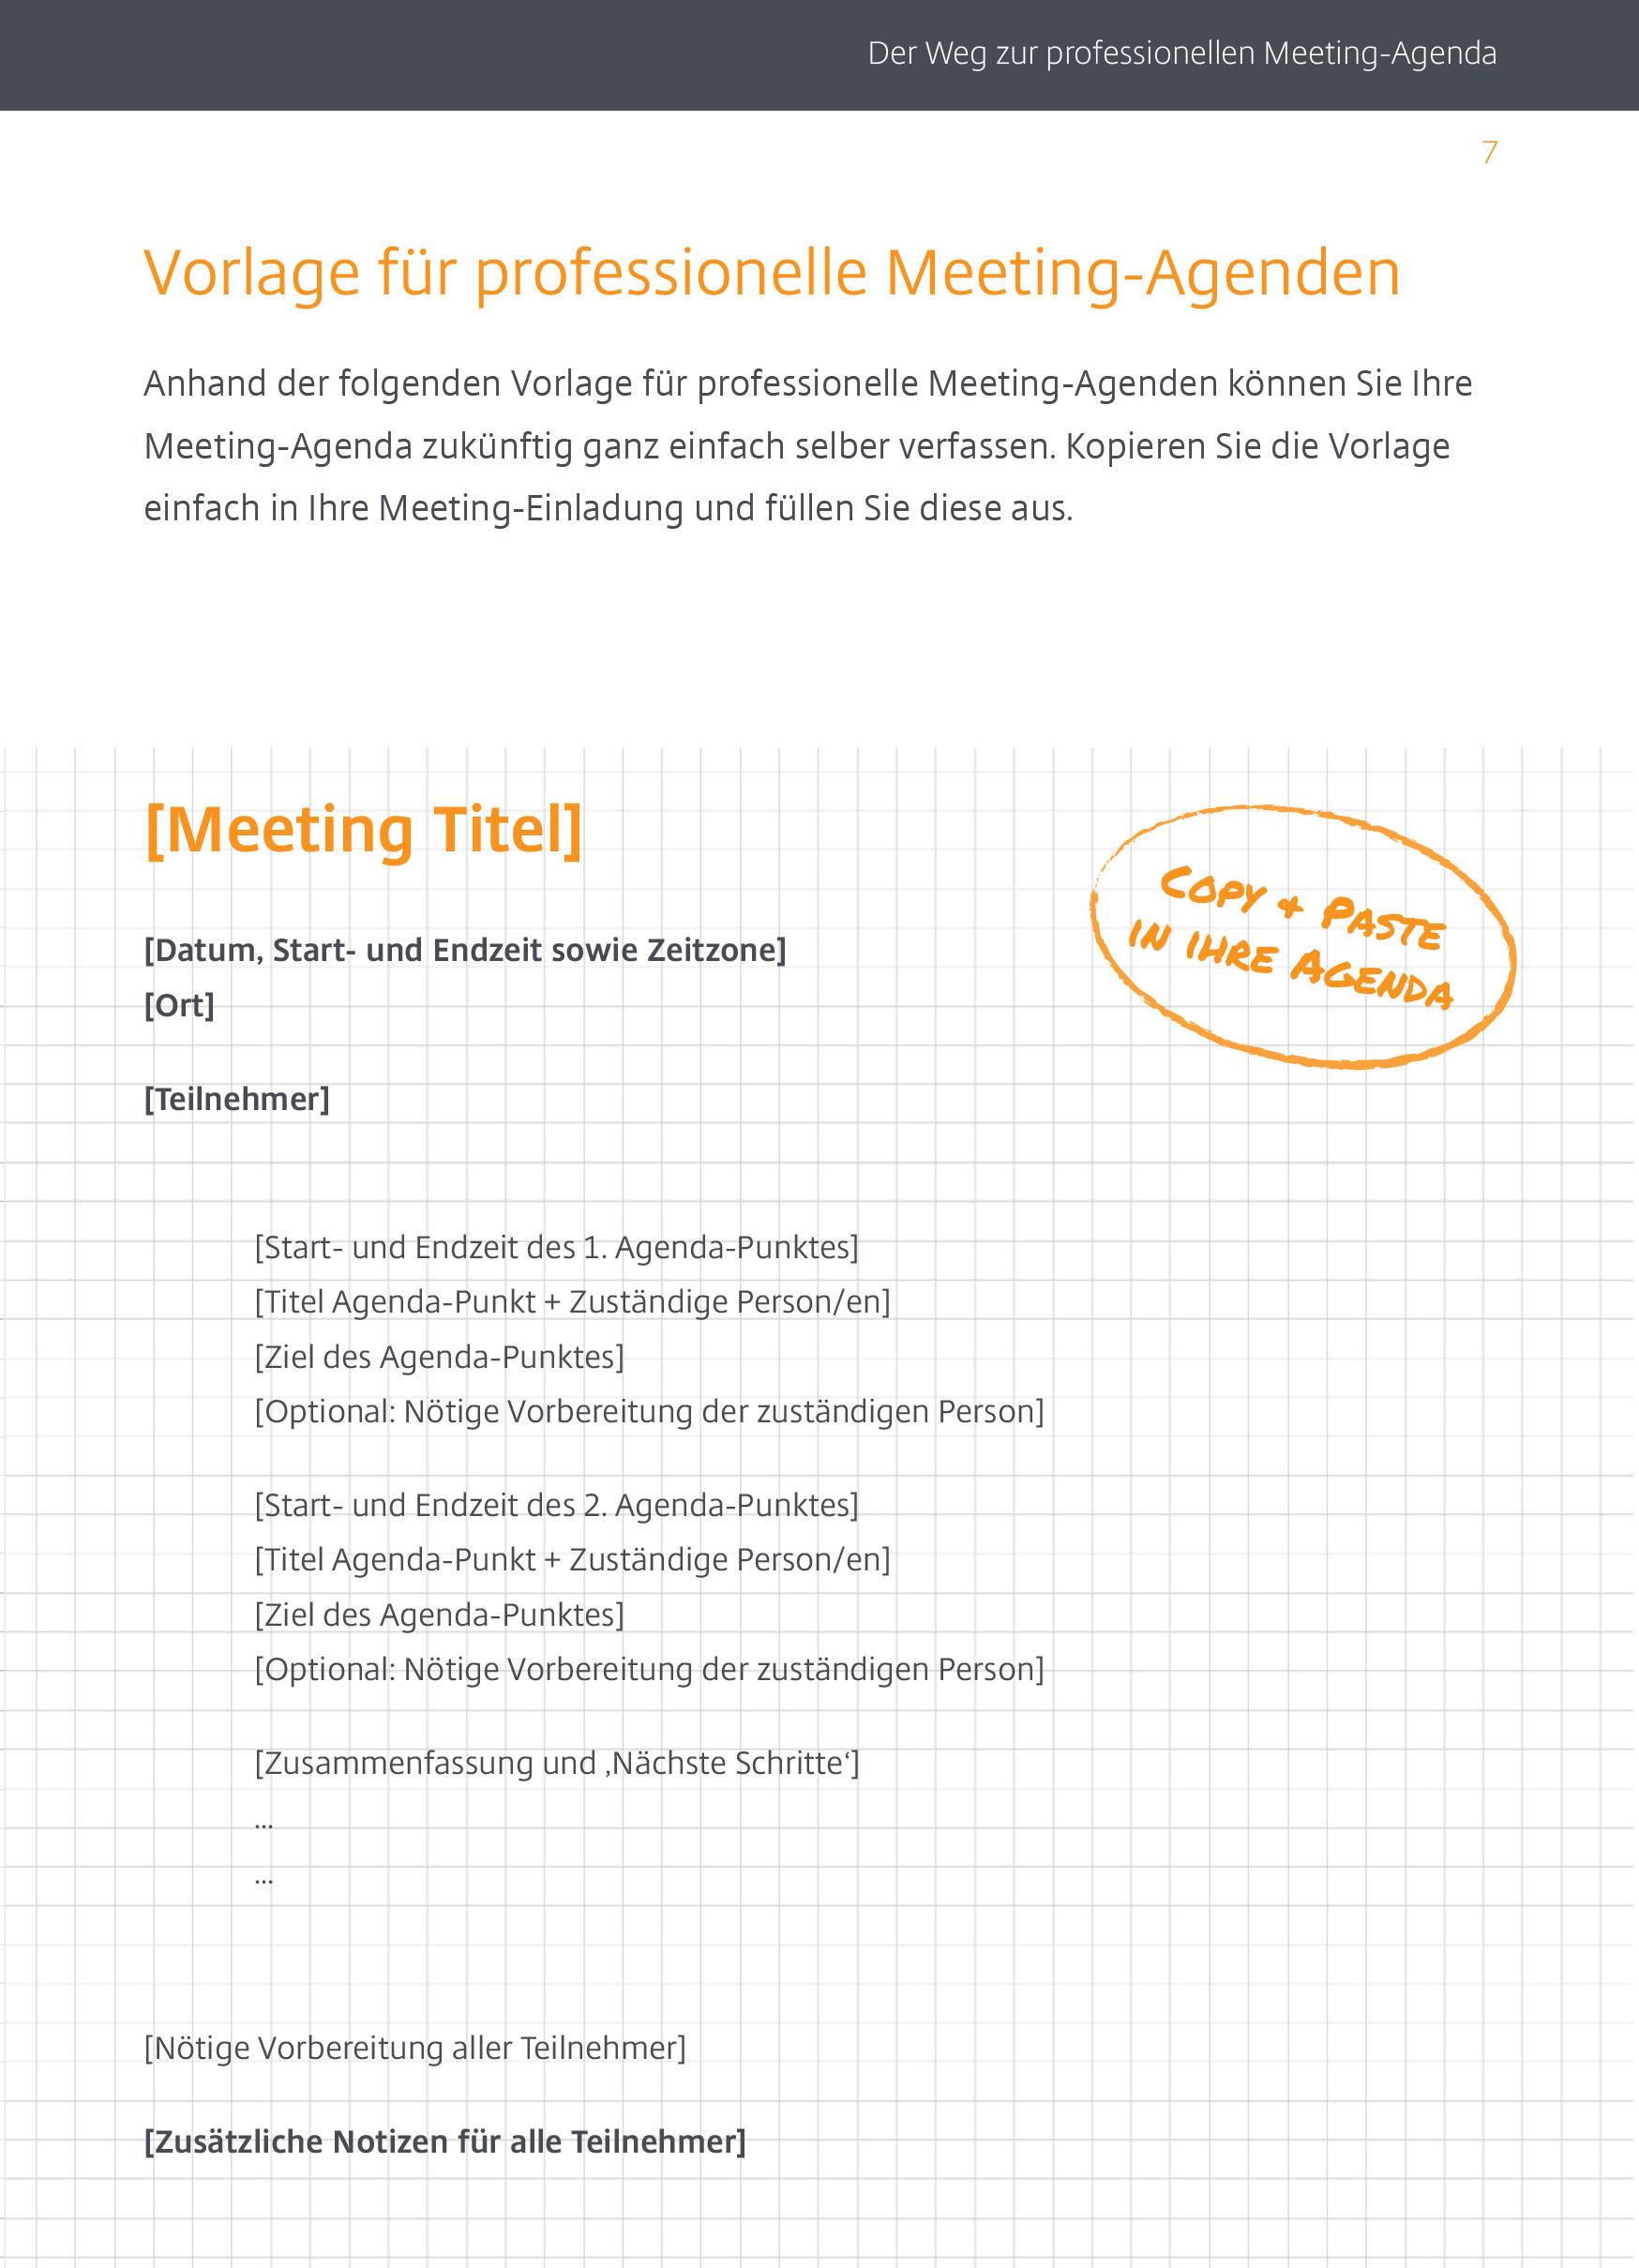 protokoll muster ǀ teambesprechung vorlage ǀ gotomeeting hub, Einladung